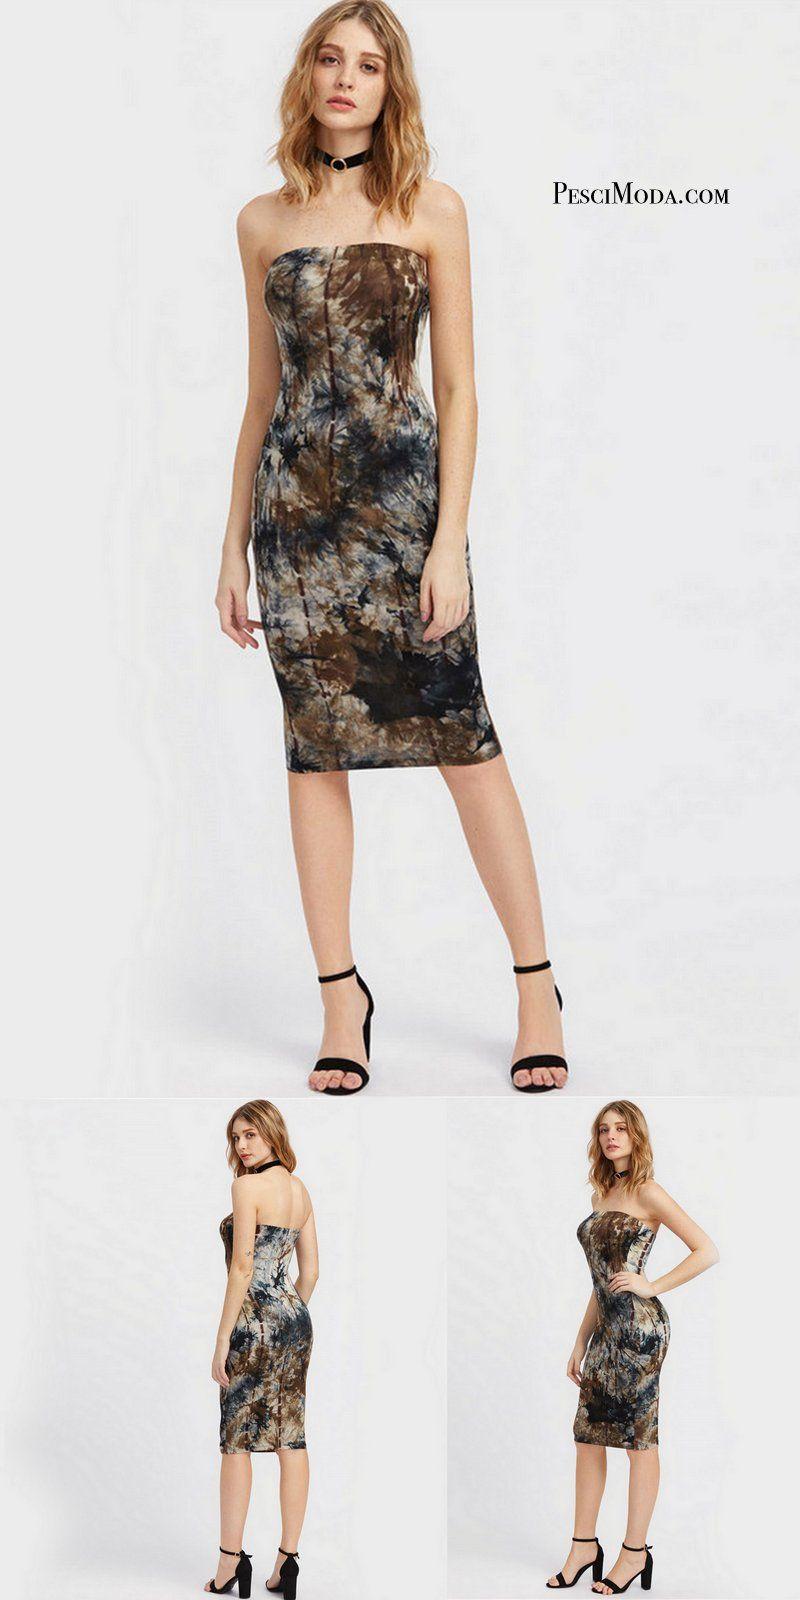 ac1631d53b5b3 Trending Black Printed Elegant Tube Dress With Free Shipping. Shop ...